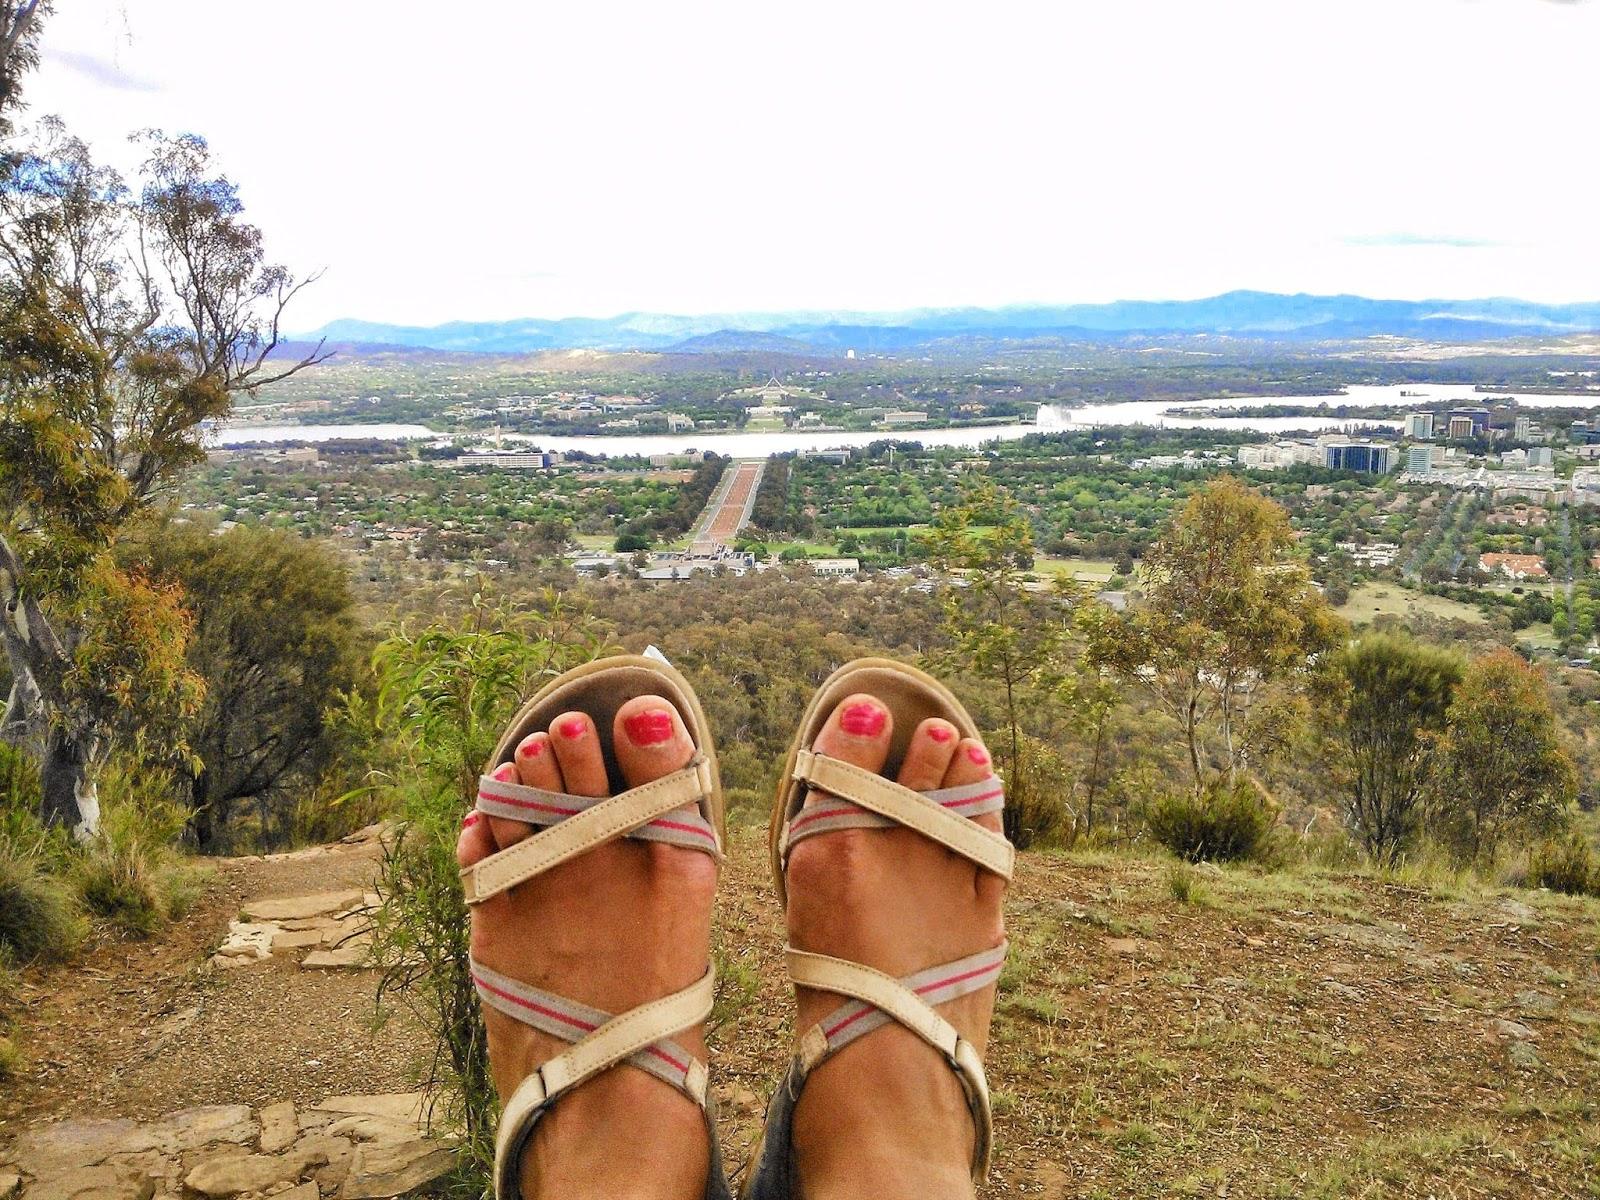 Canberra dating tapahtumia